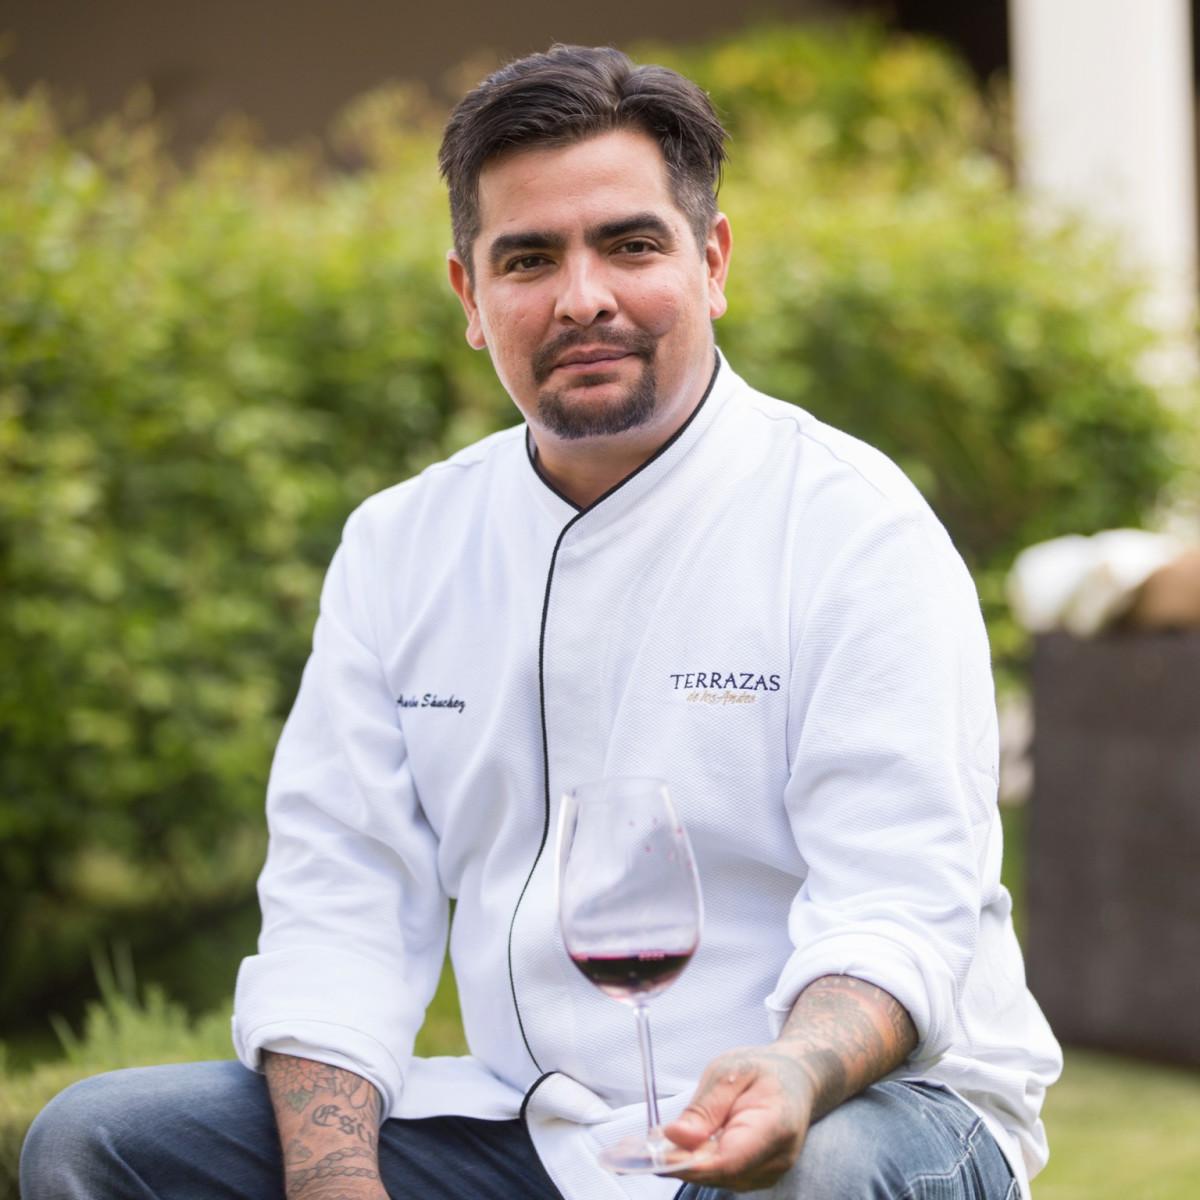 Masterchef Star Aarón Sánchez Cooks Up A Hot Houston